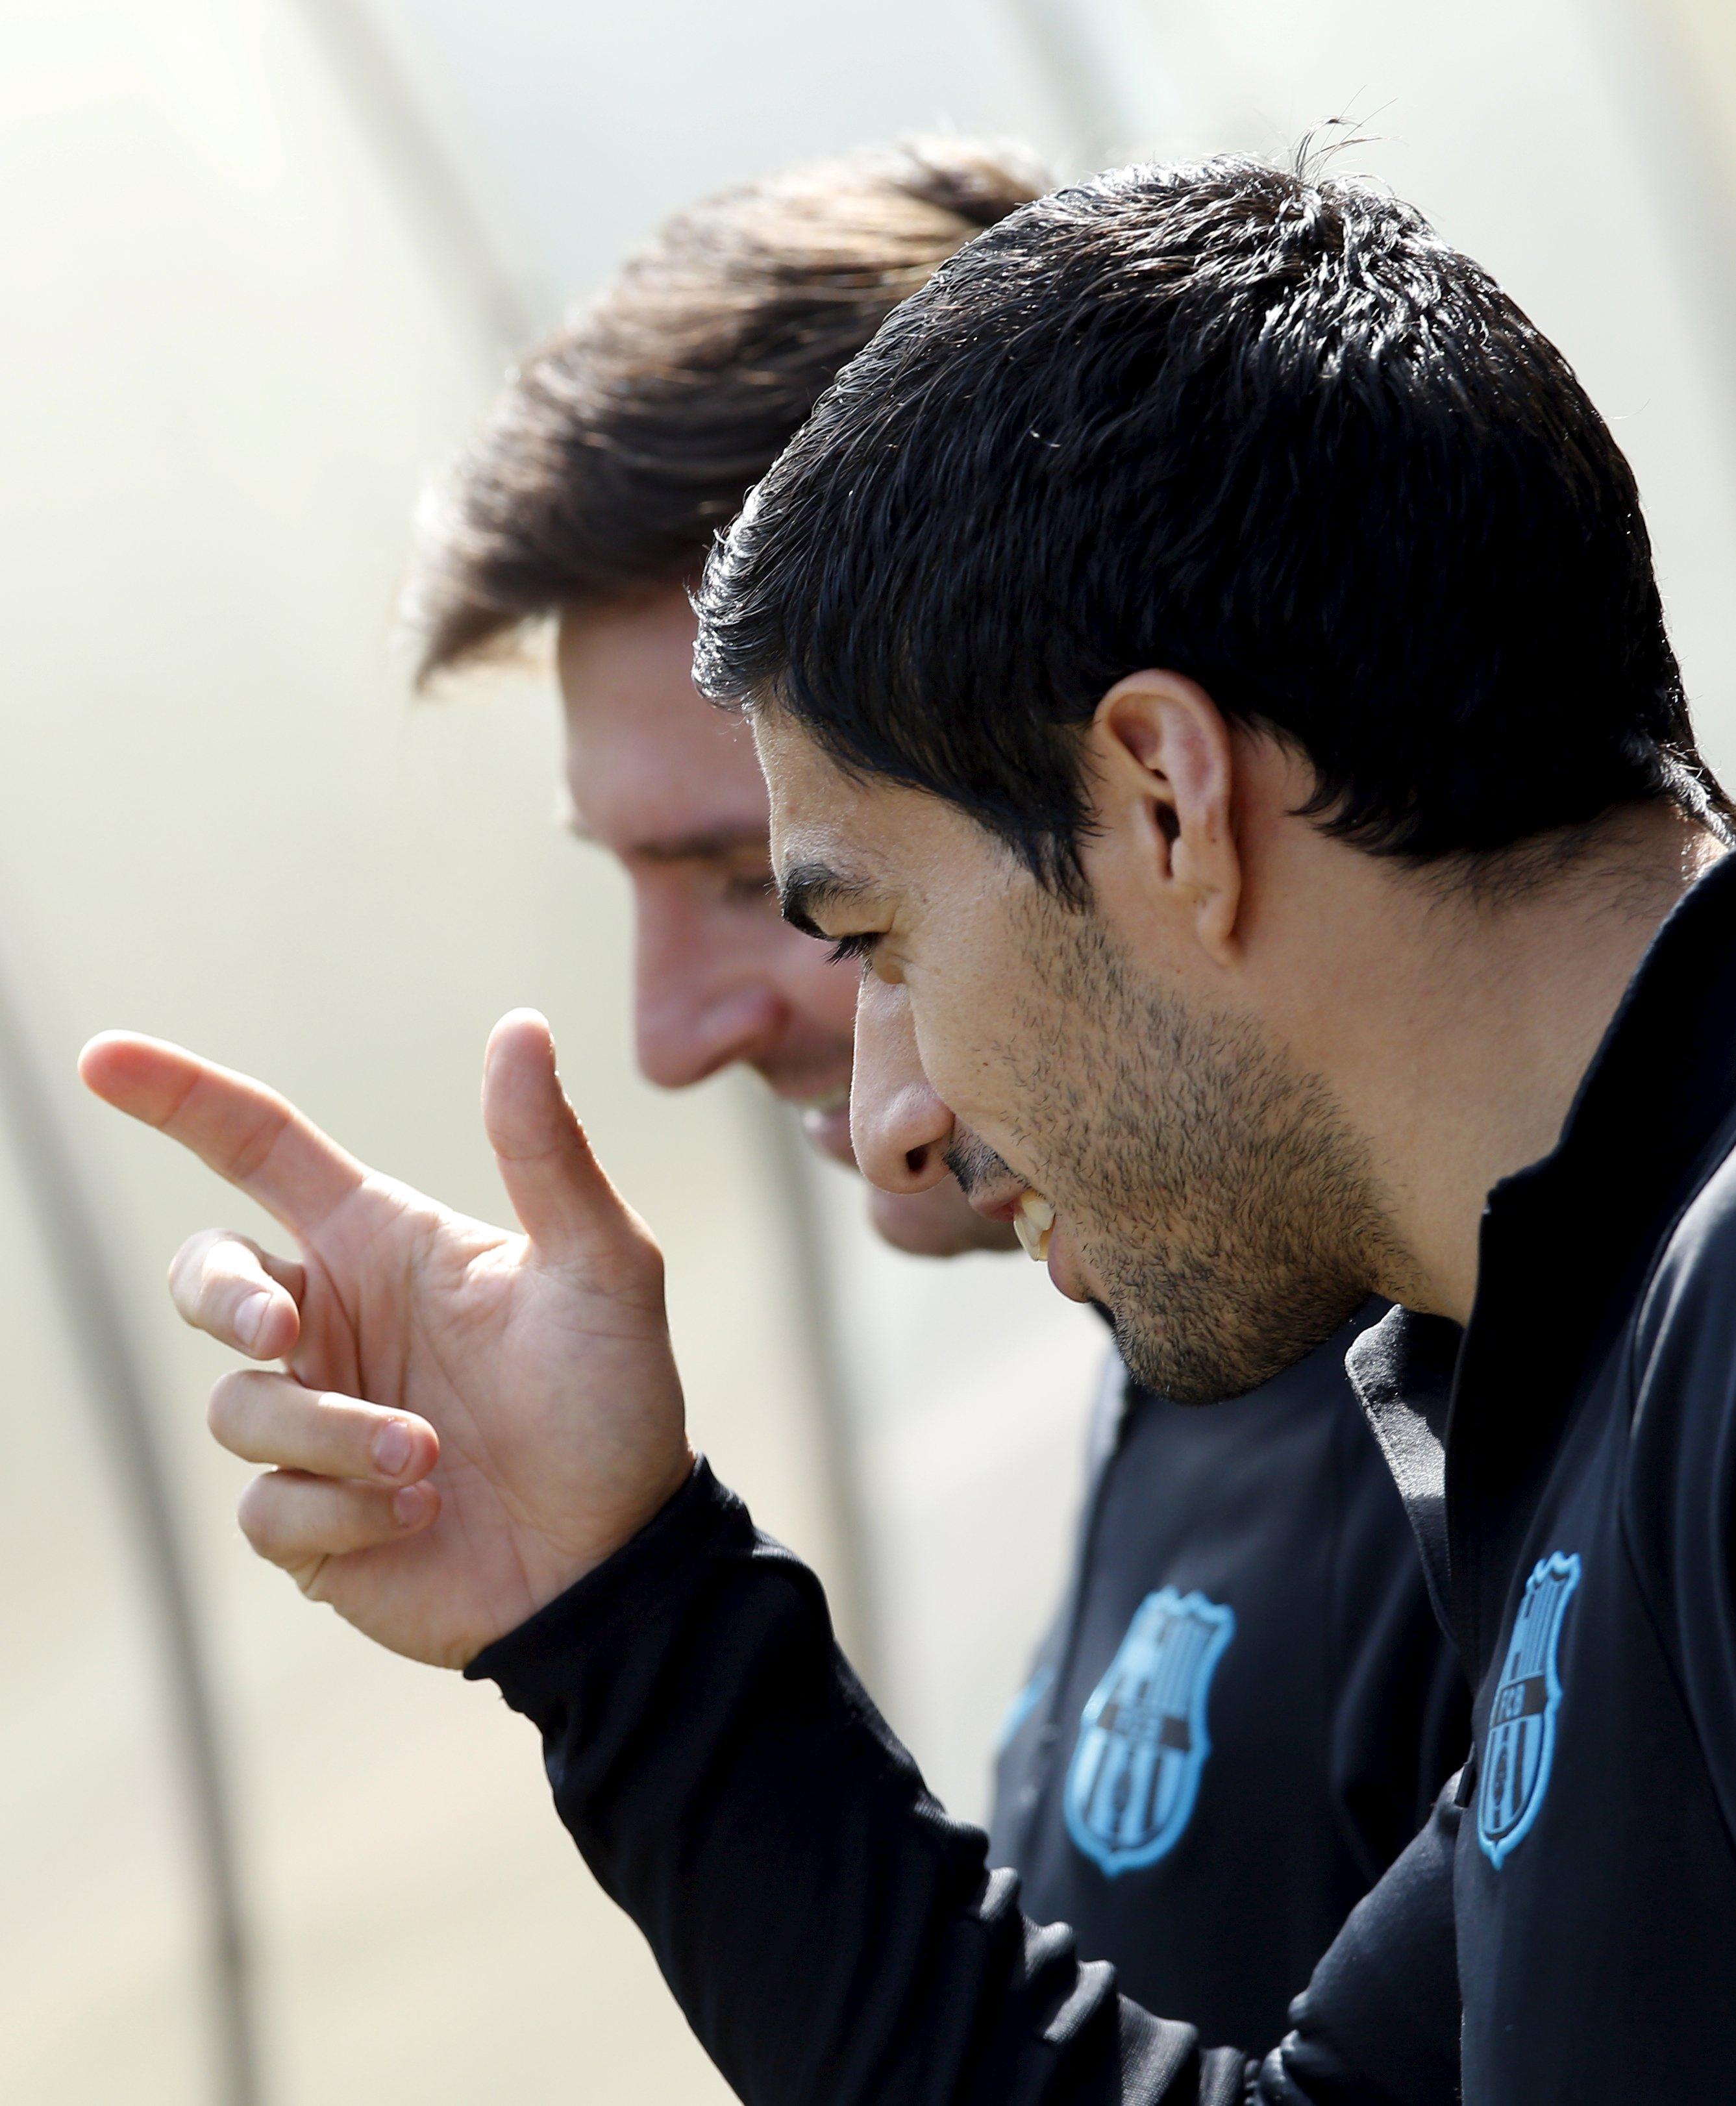 Misfiring Barcelona seek response at Atletico